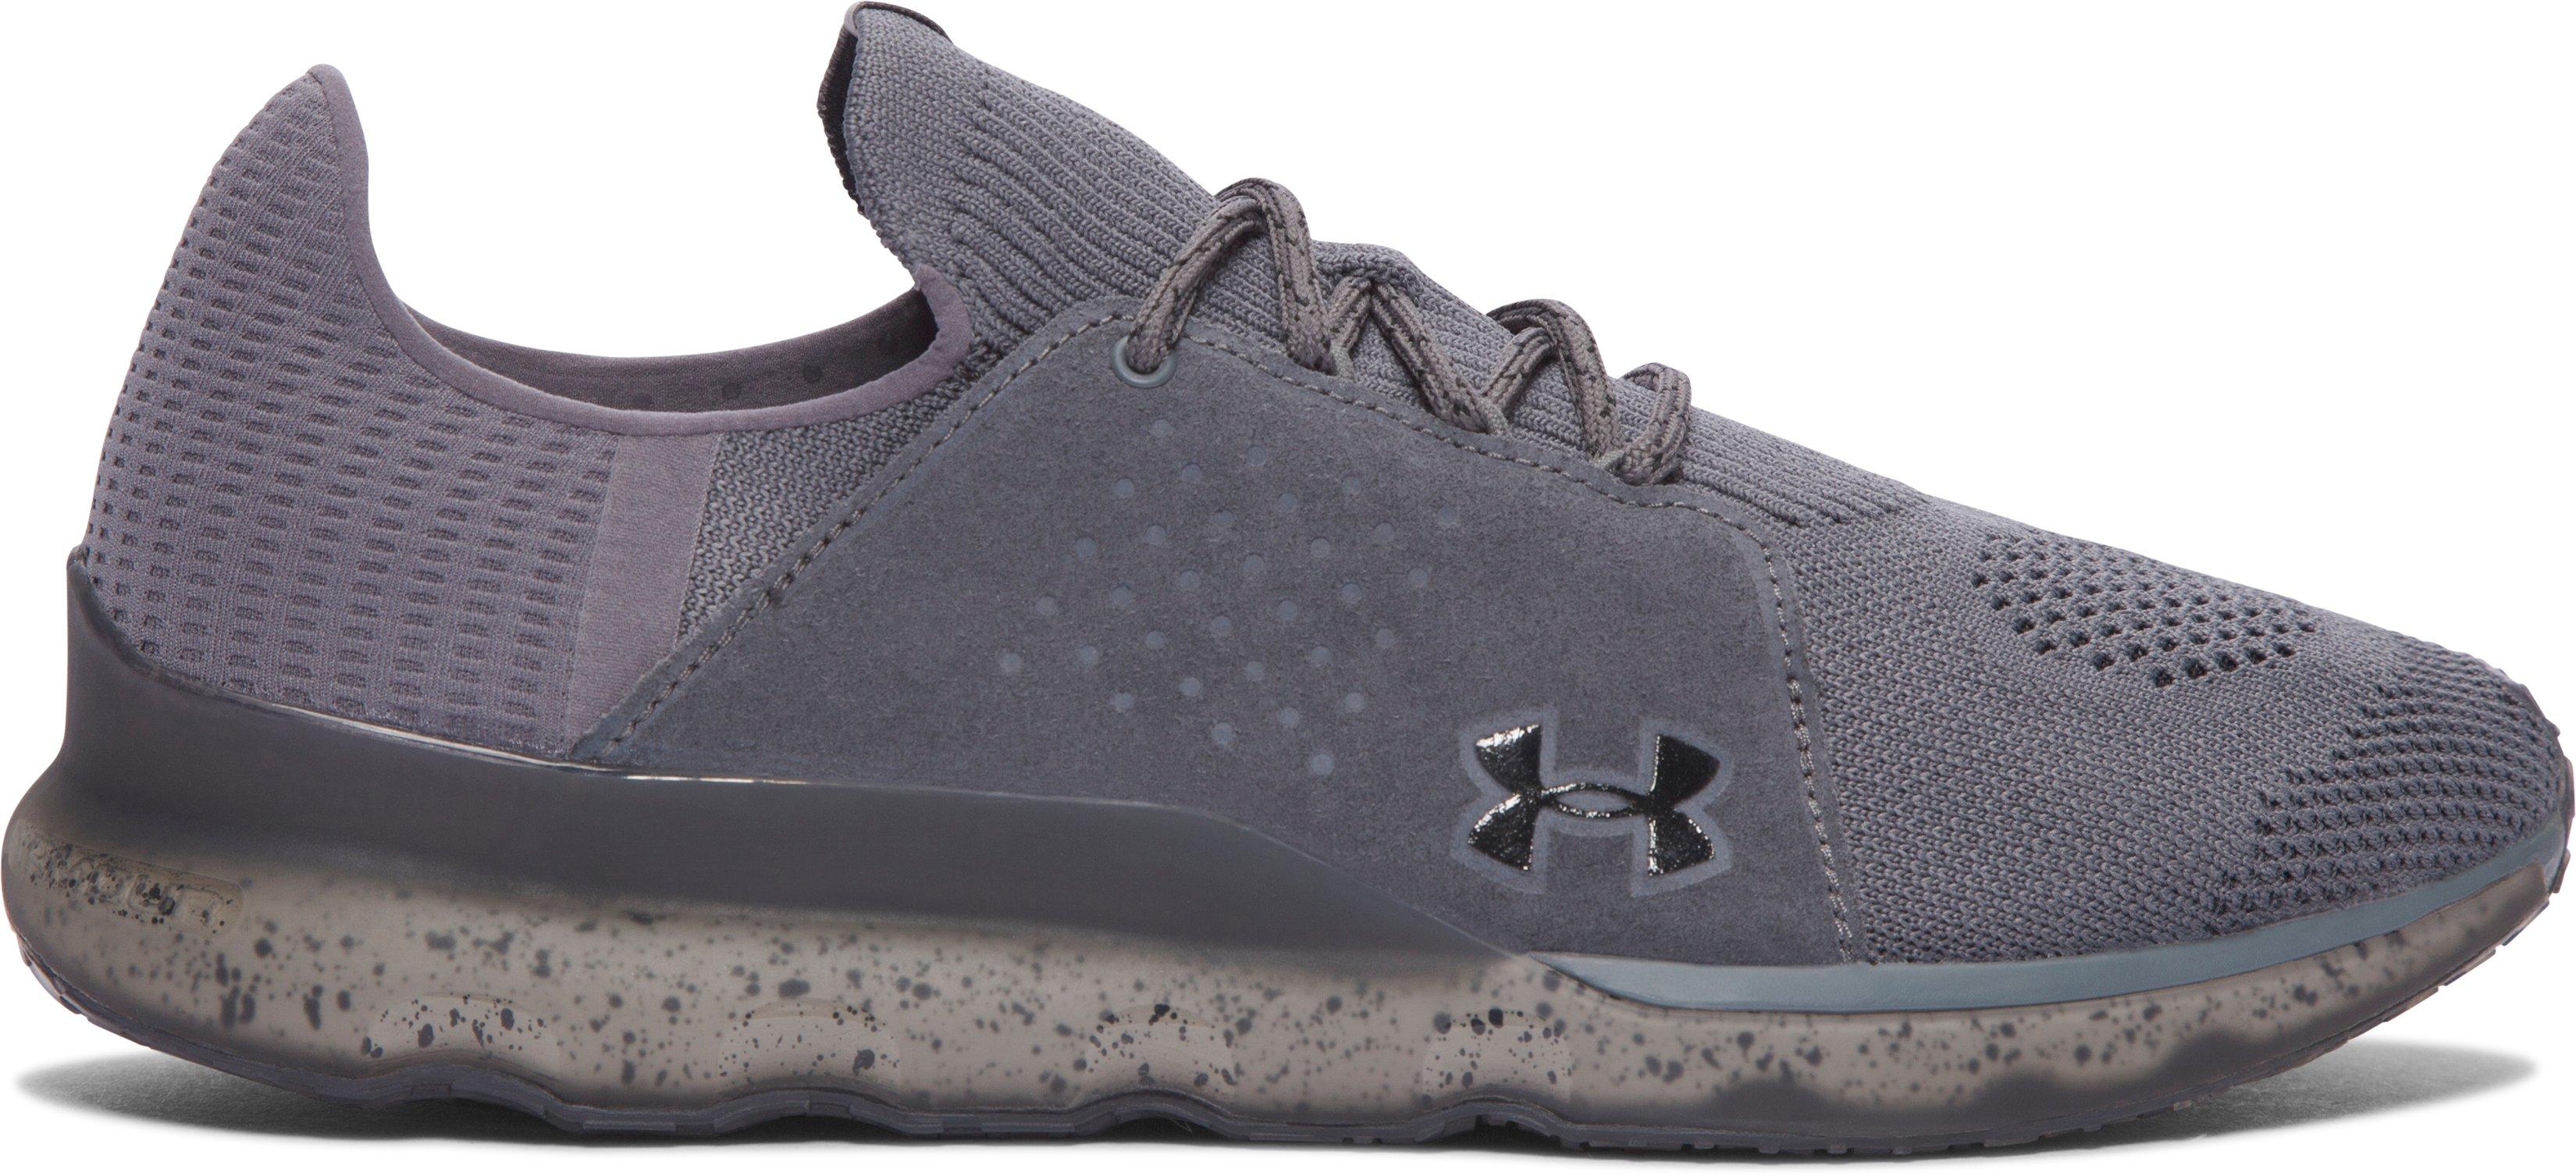 Men's UA Threadborne Reveal Running Shoes, 360 degree view